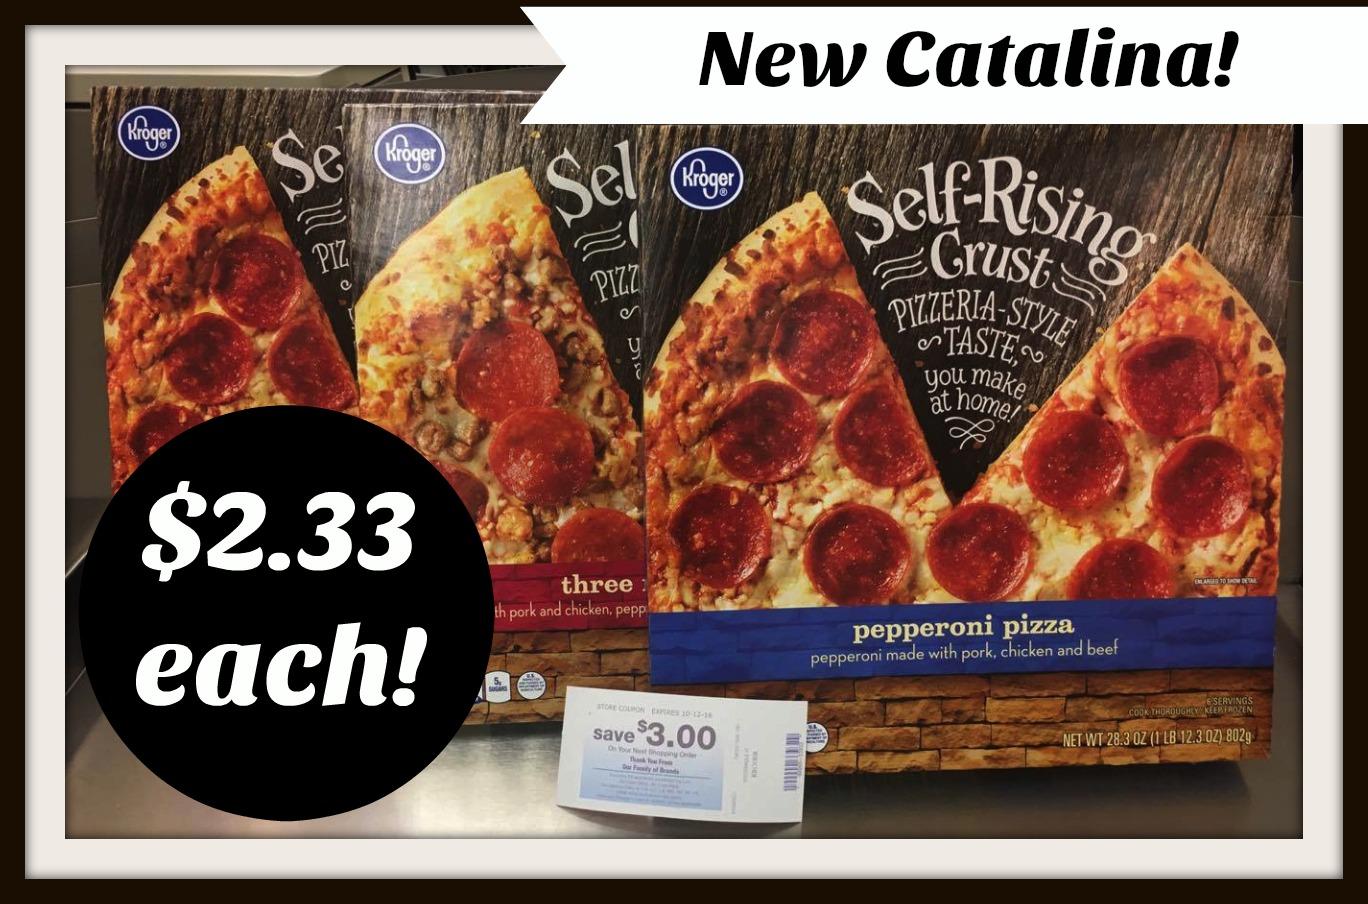 kroger-pizza-catalina